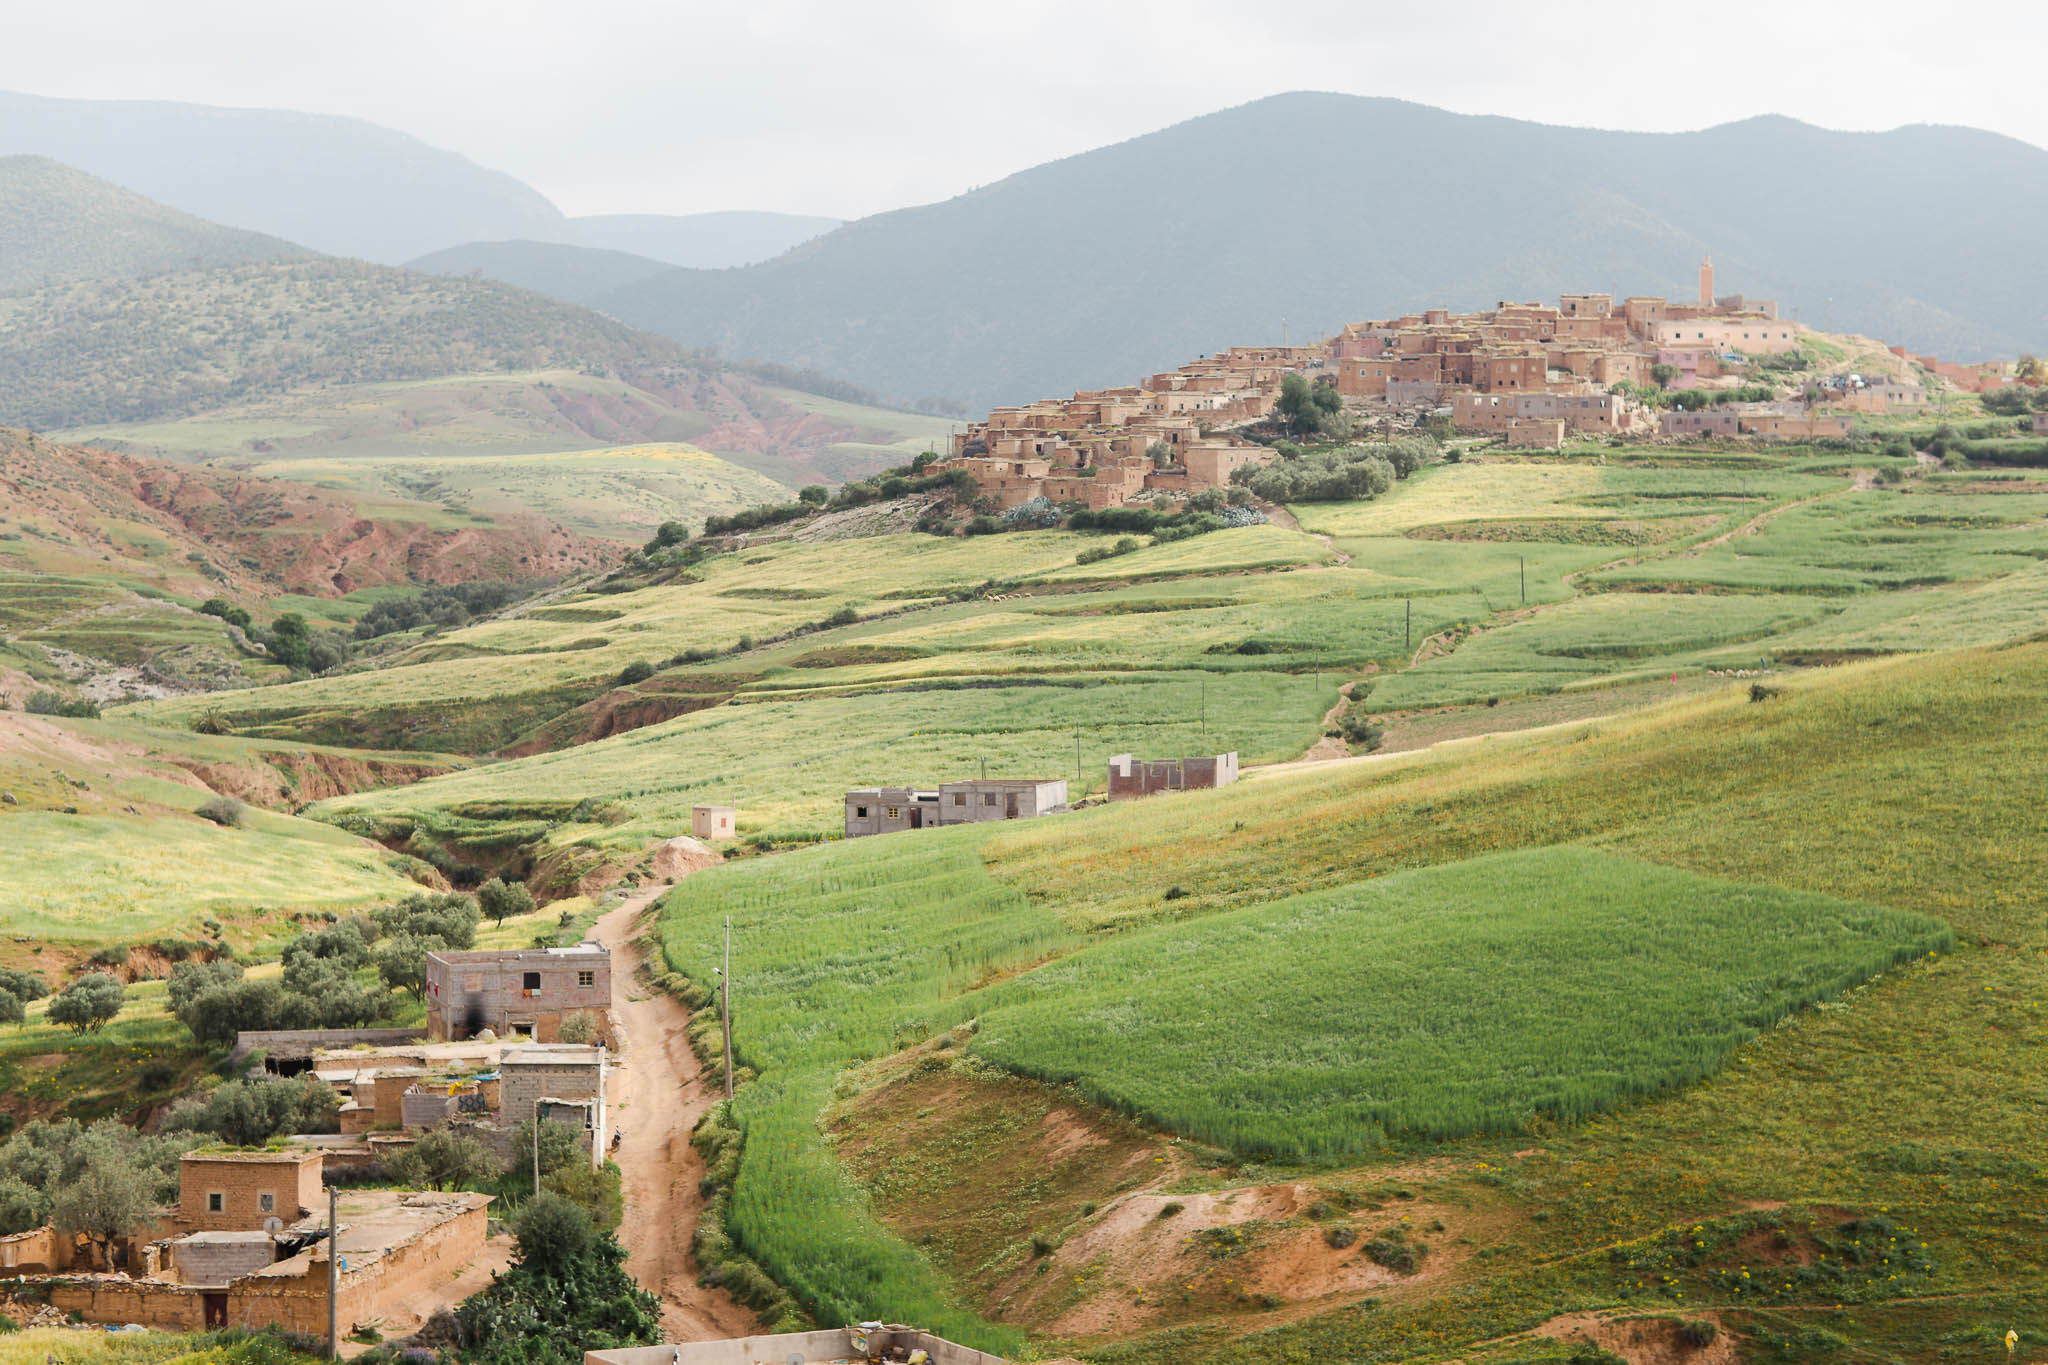 luksusowe podróże boutikowe - My Boutique Travel - Maroko